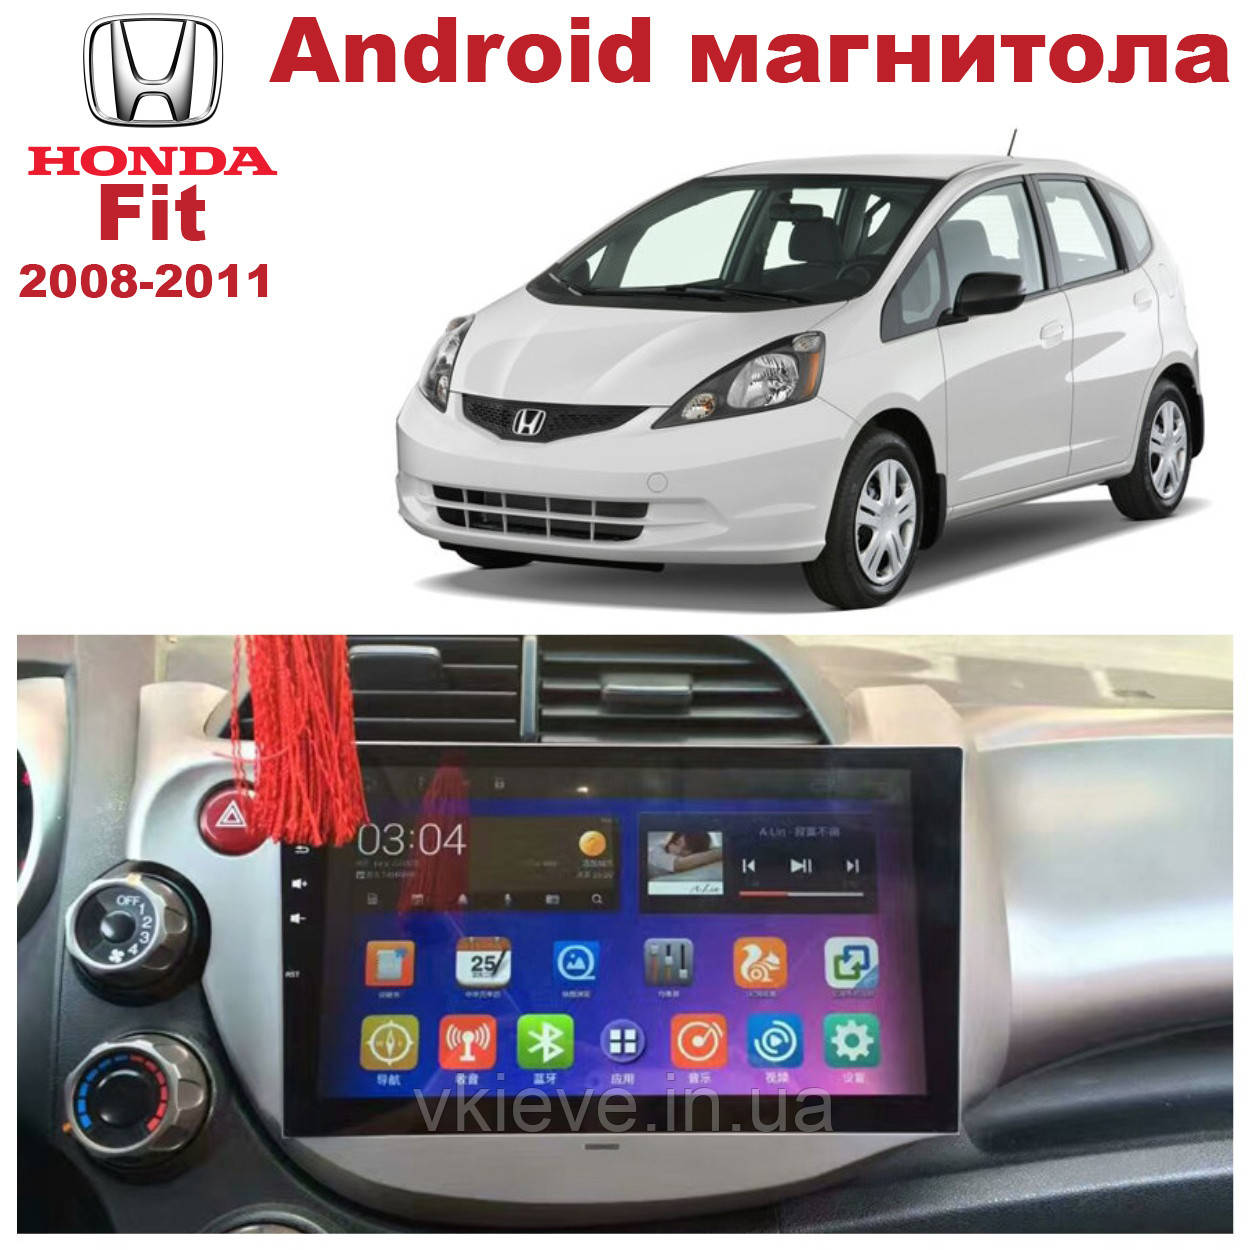 Штатная автомагнитола для Honda FIT 2008-2011 на ANDROID 8.1 (М-ХФт-10)